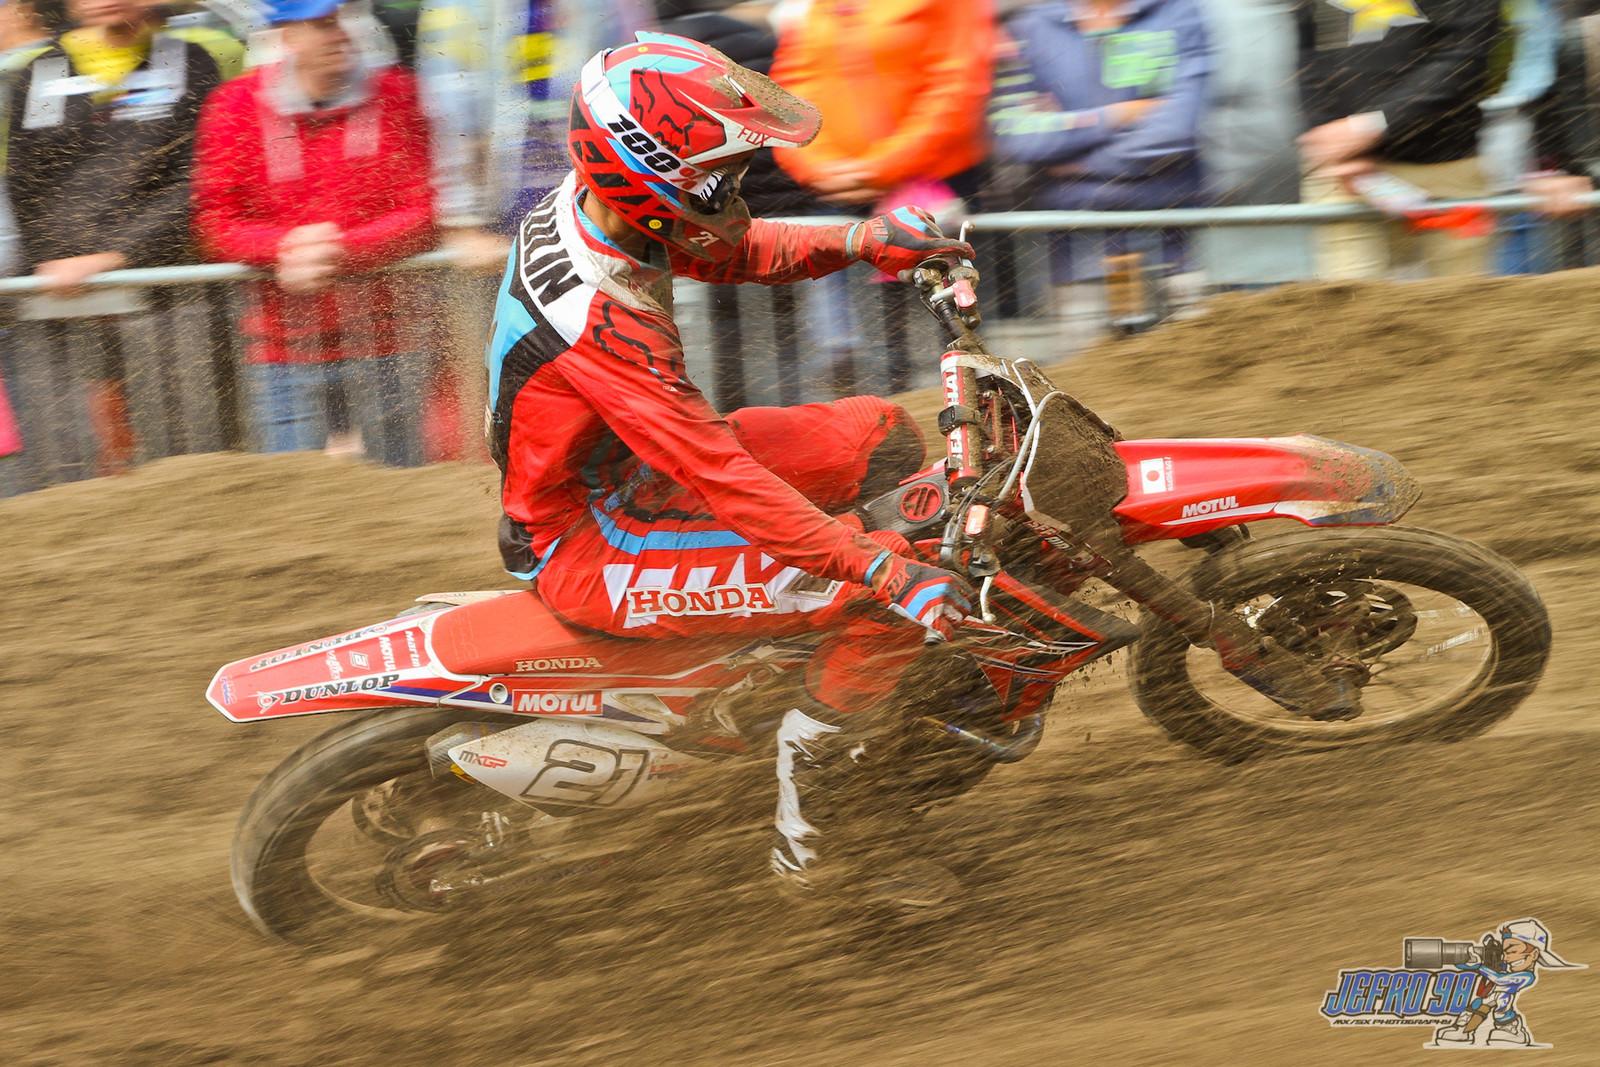 Gautier Paulin - Photo Gallery: MXGP of Limburg - Motocross Pictures - Vital MX